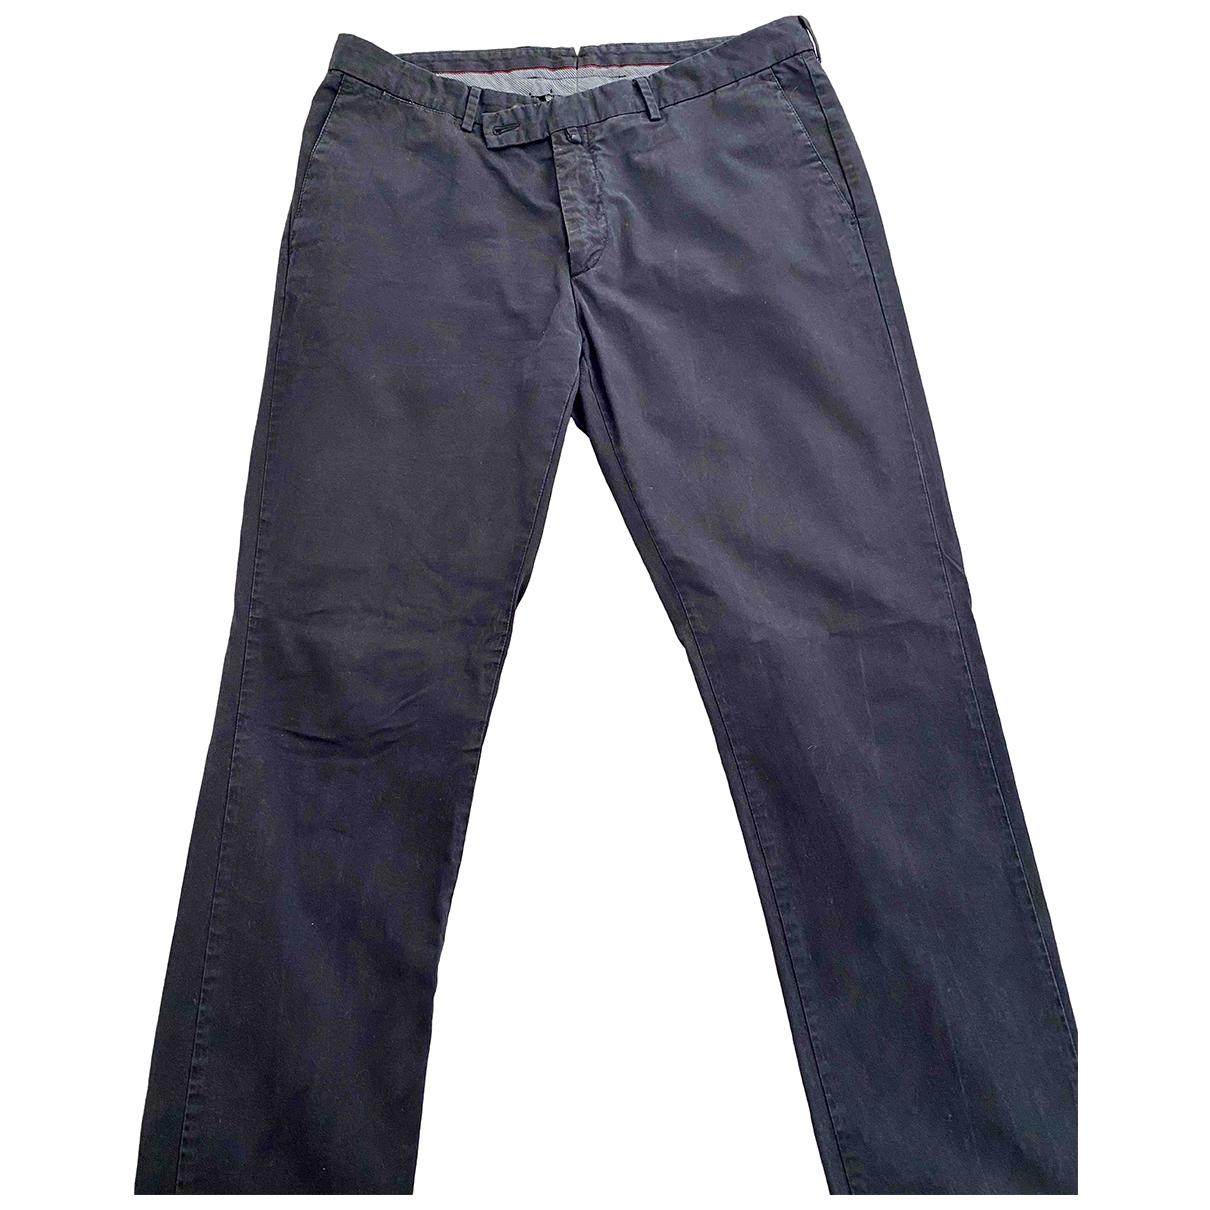 Hackett London \N Navy Cotton Trousers for Men 38 UK - US